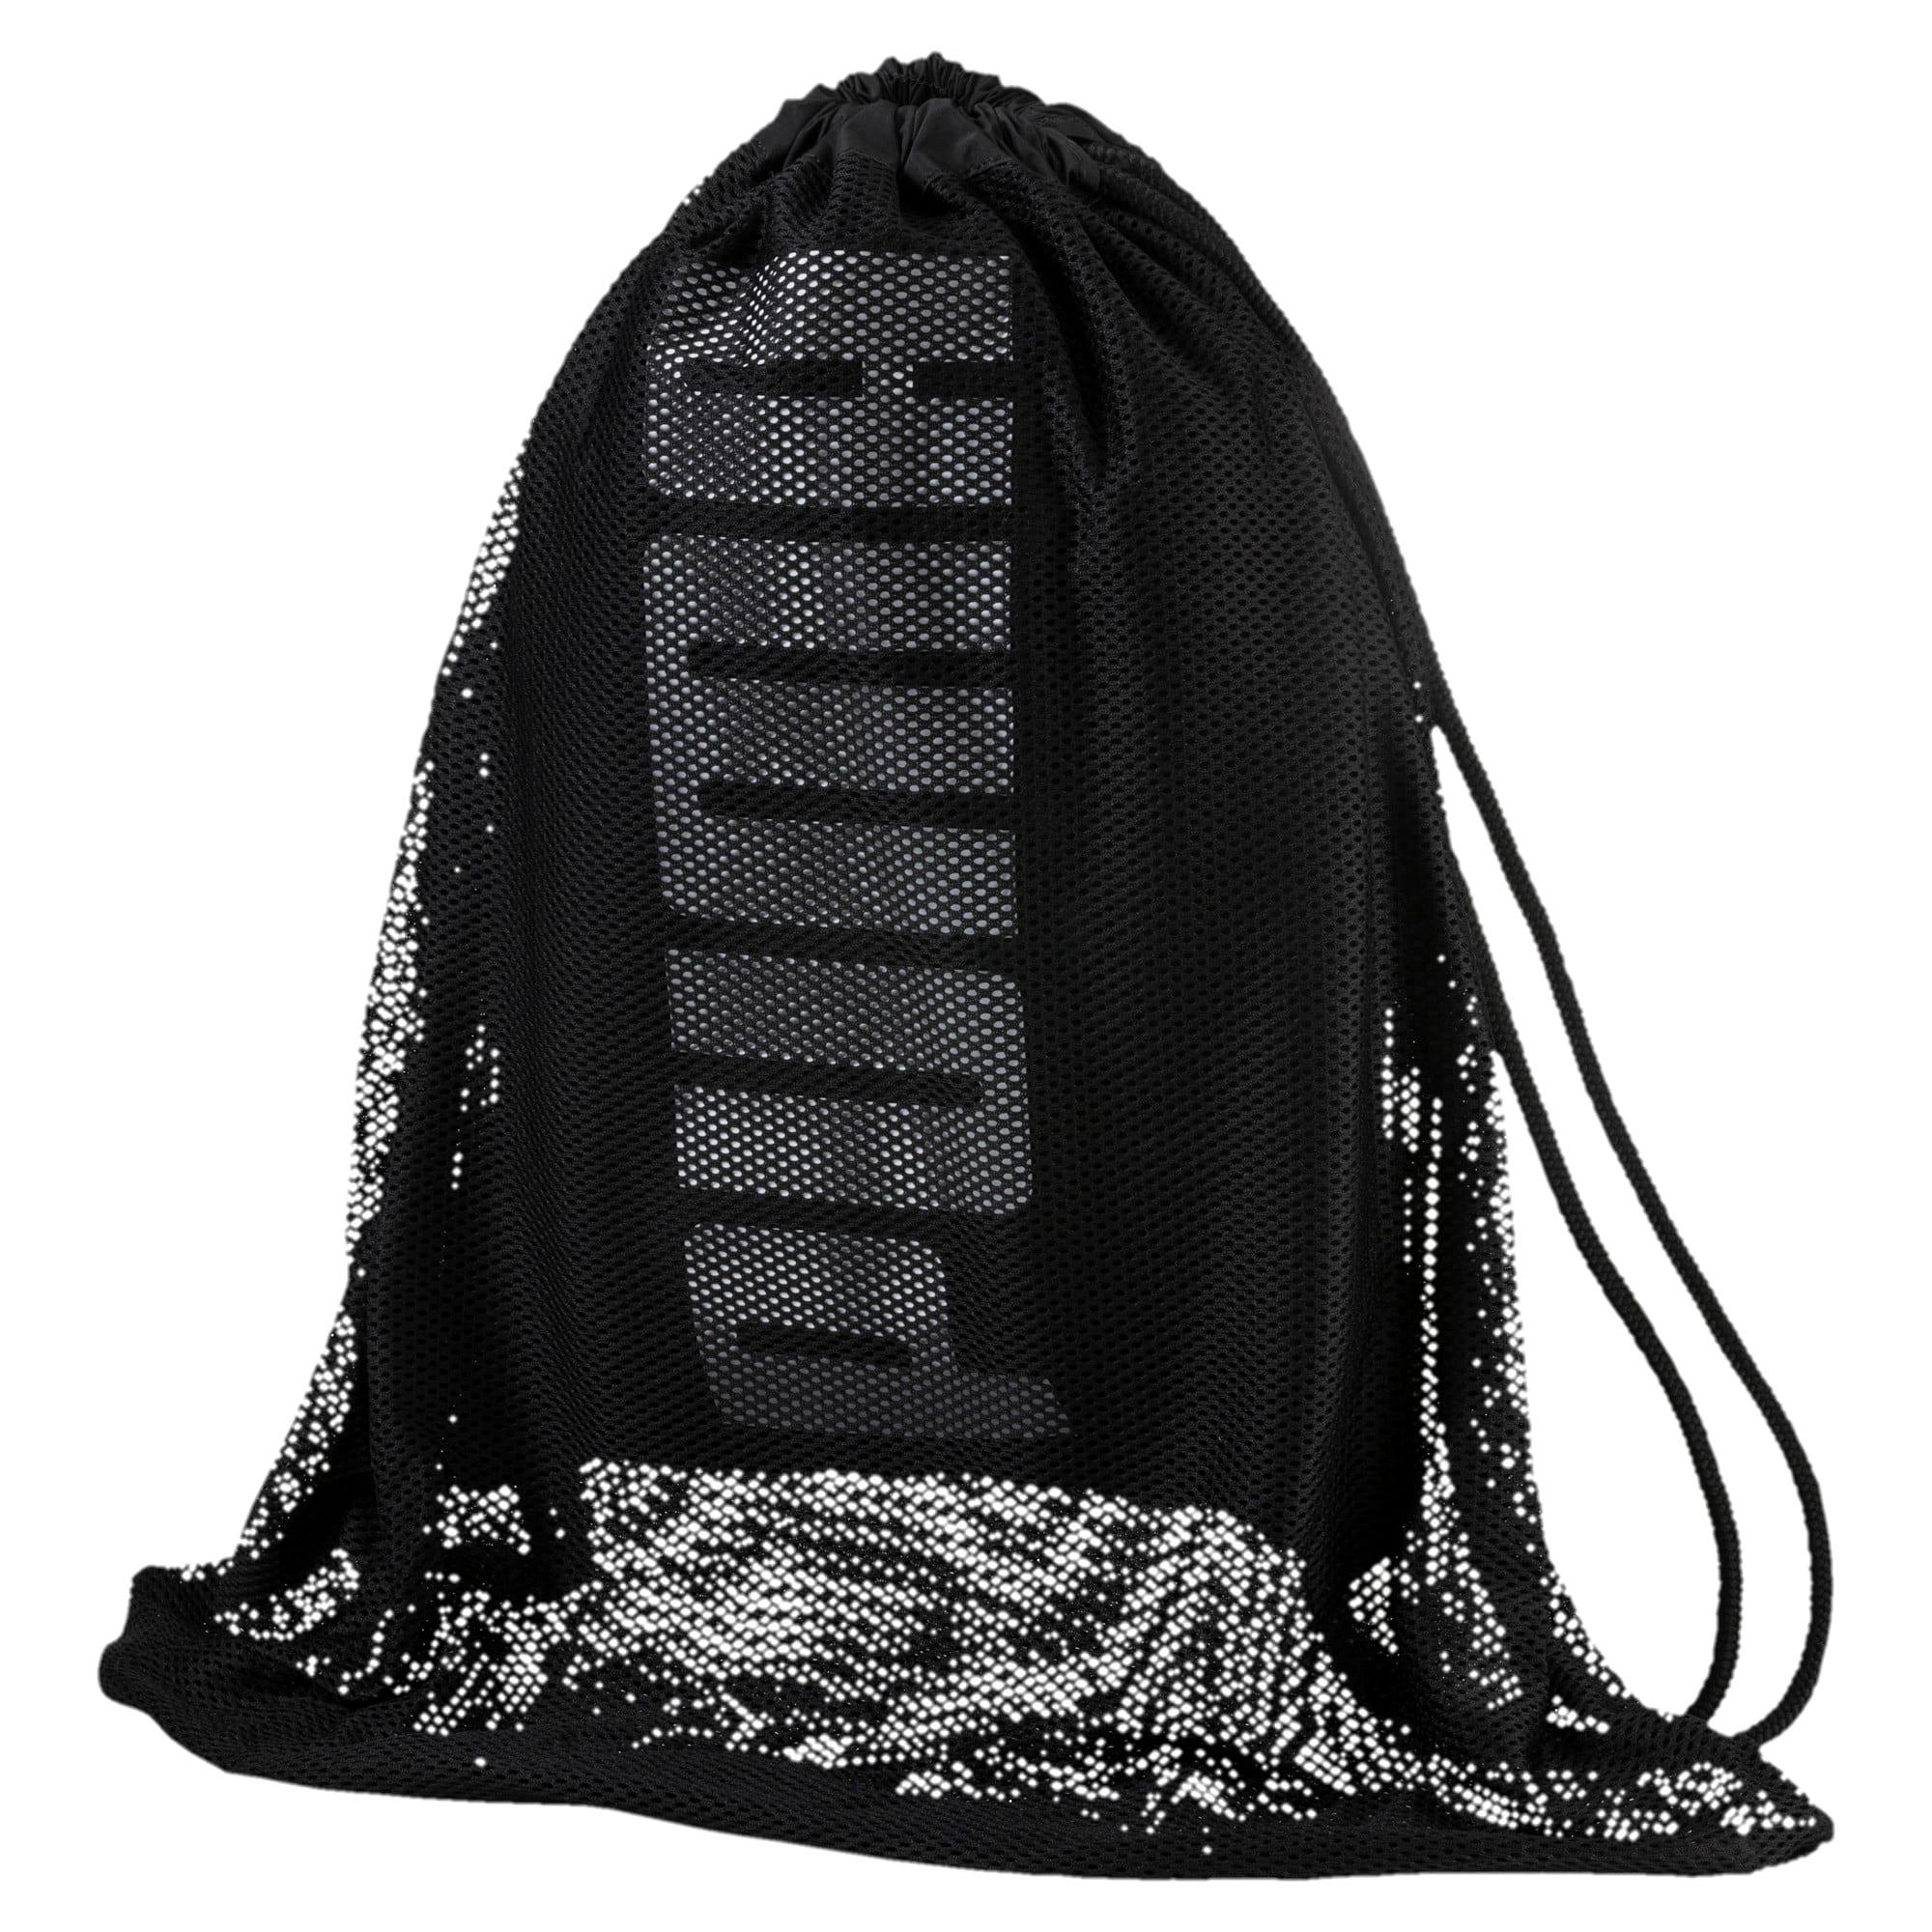 Thumbnail 1 of Archive Women's Prime X-treme Gym Bag, Puma Black, medium-IND